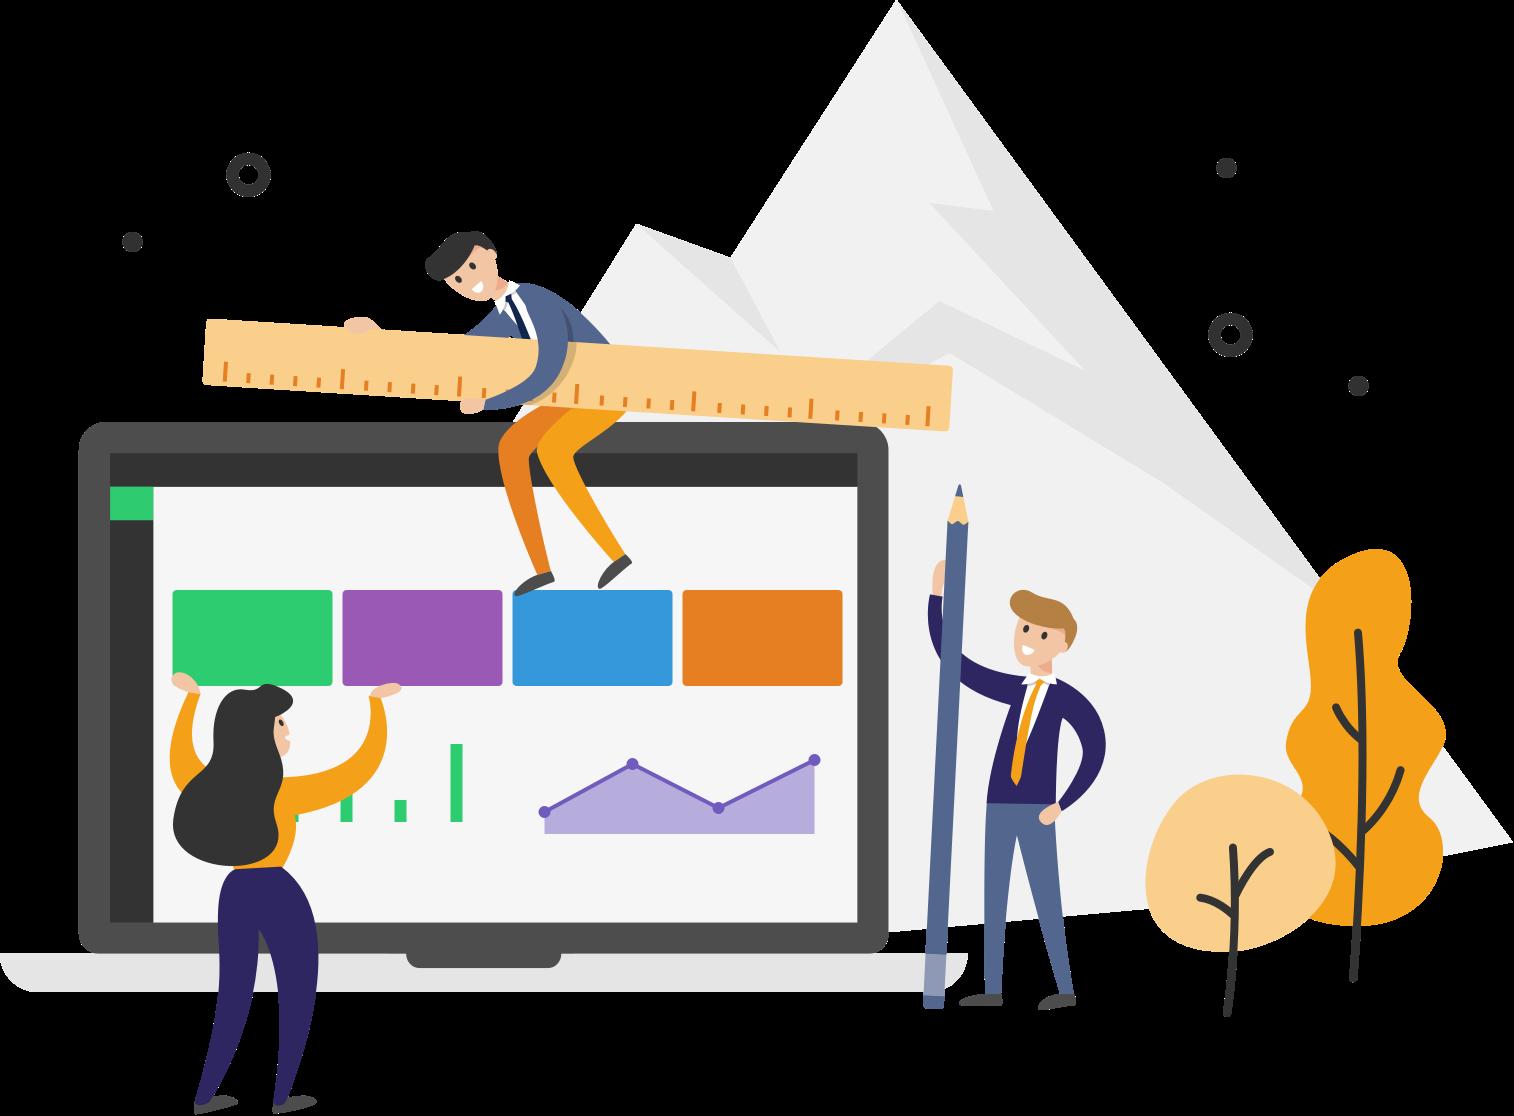 About salesscreen customers. Motivation clipart achievement motivation